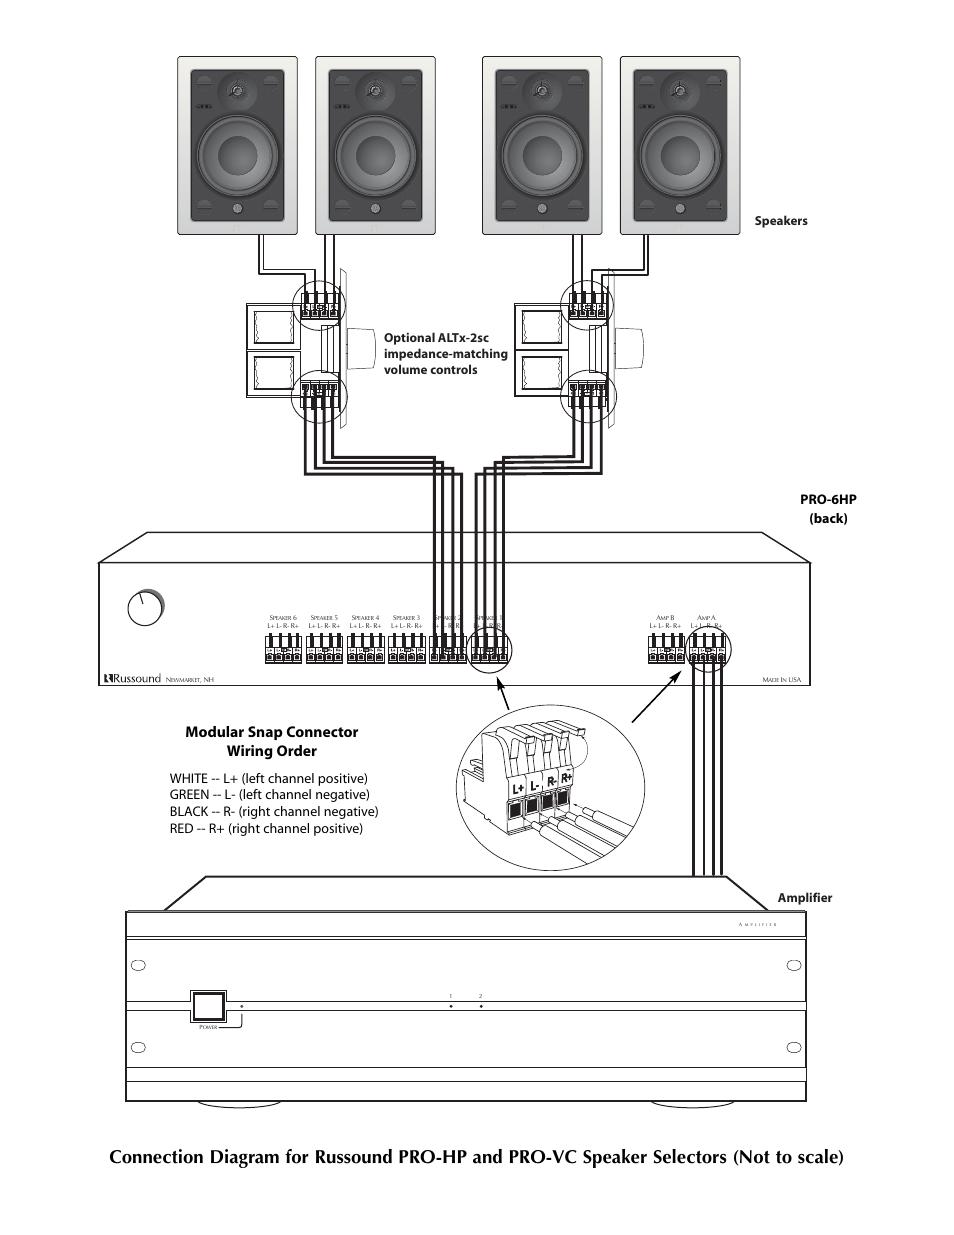 hight resolution of russound volume control wiring diagram wiring diagram insiderussound wiring diagram wiring diagram expert russound volume control